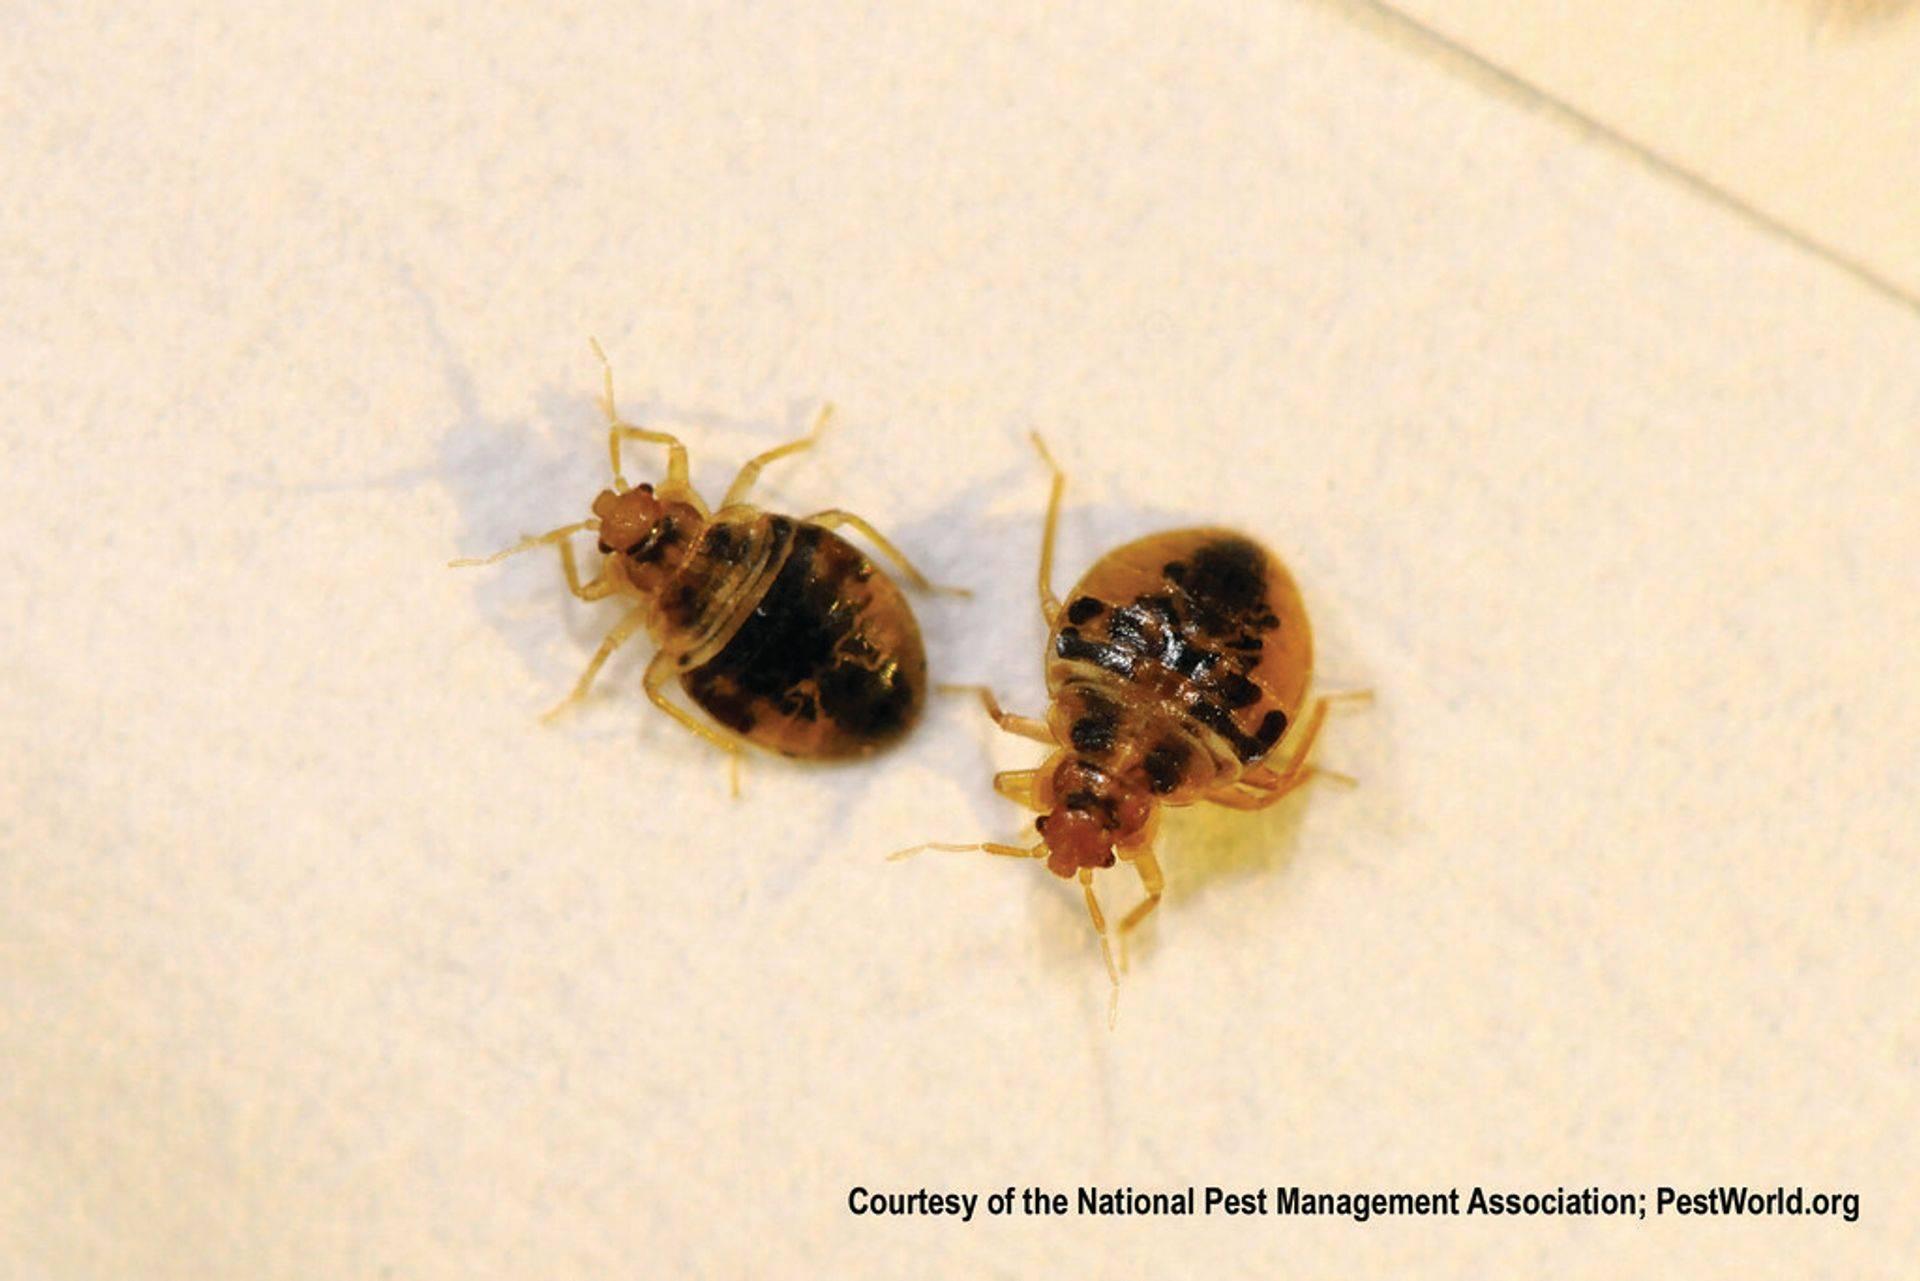 Bed bug nymphs